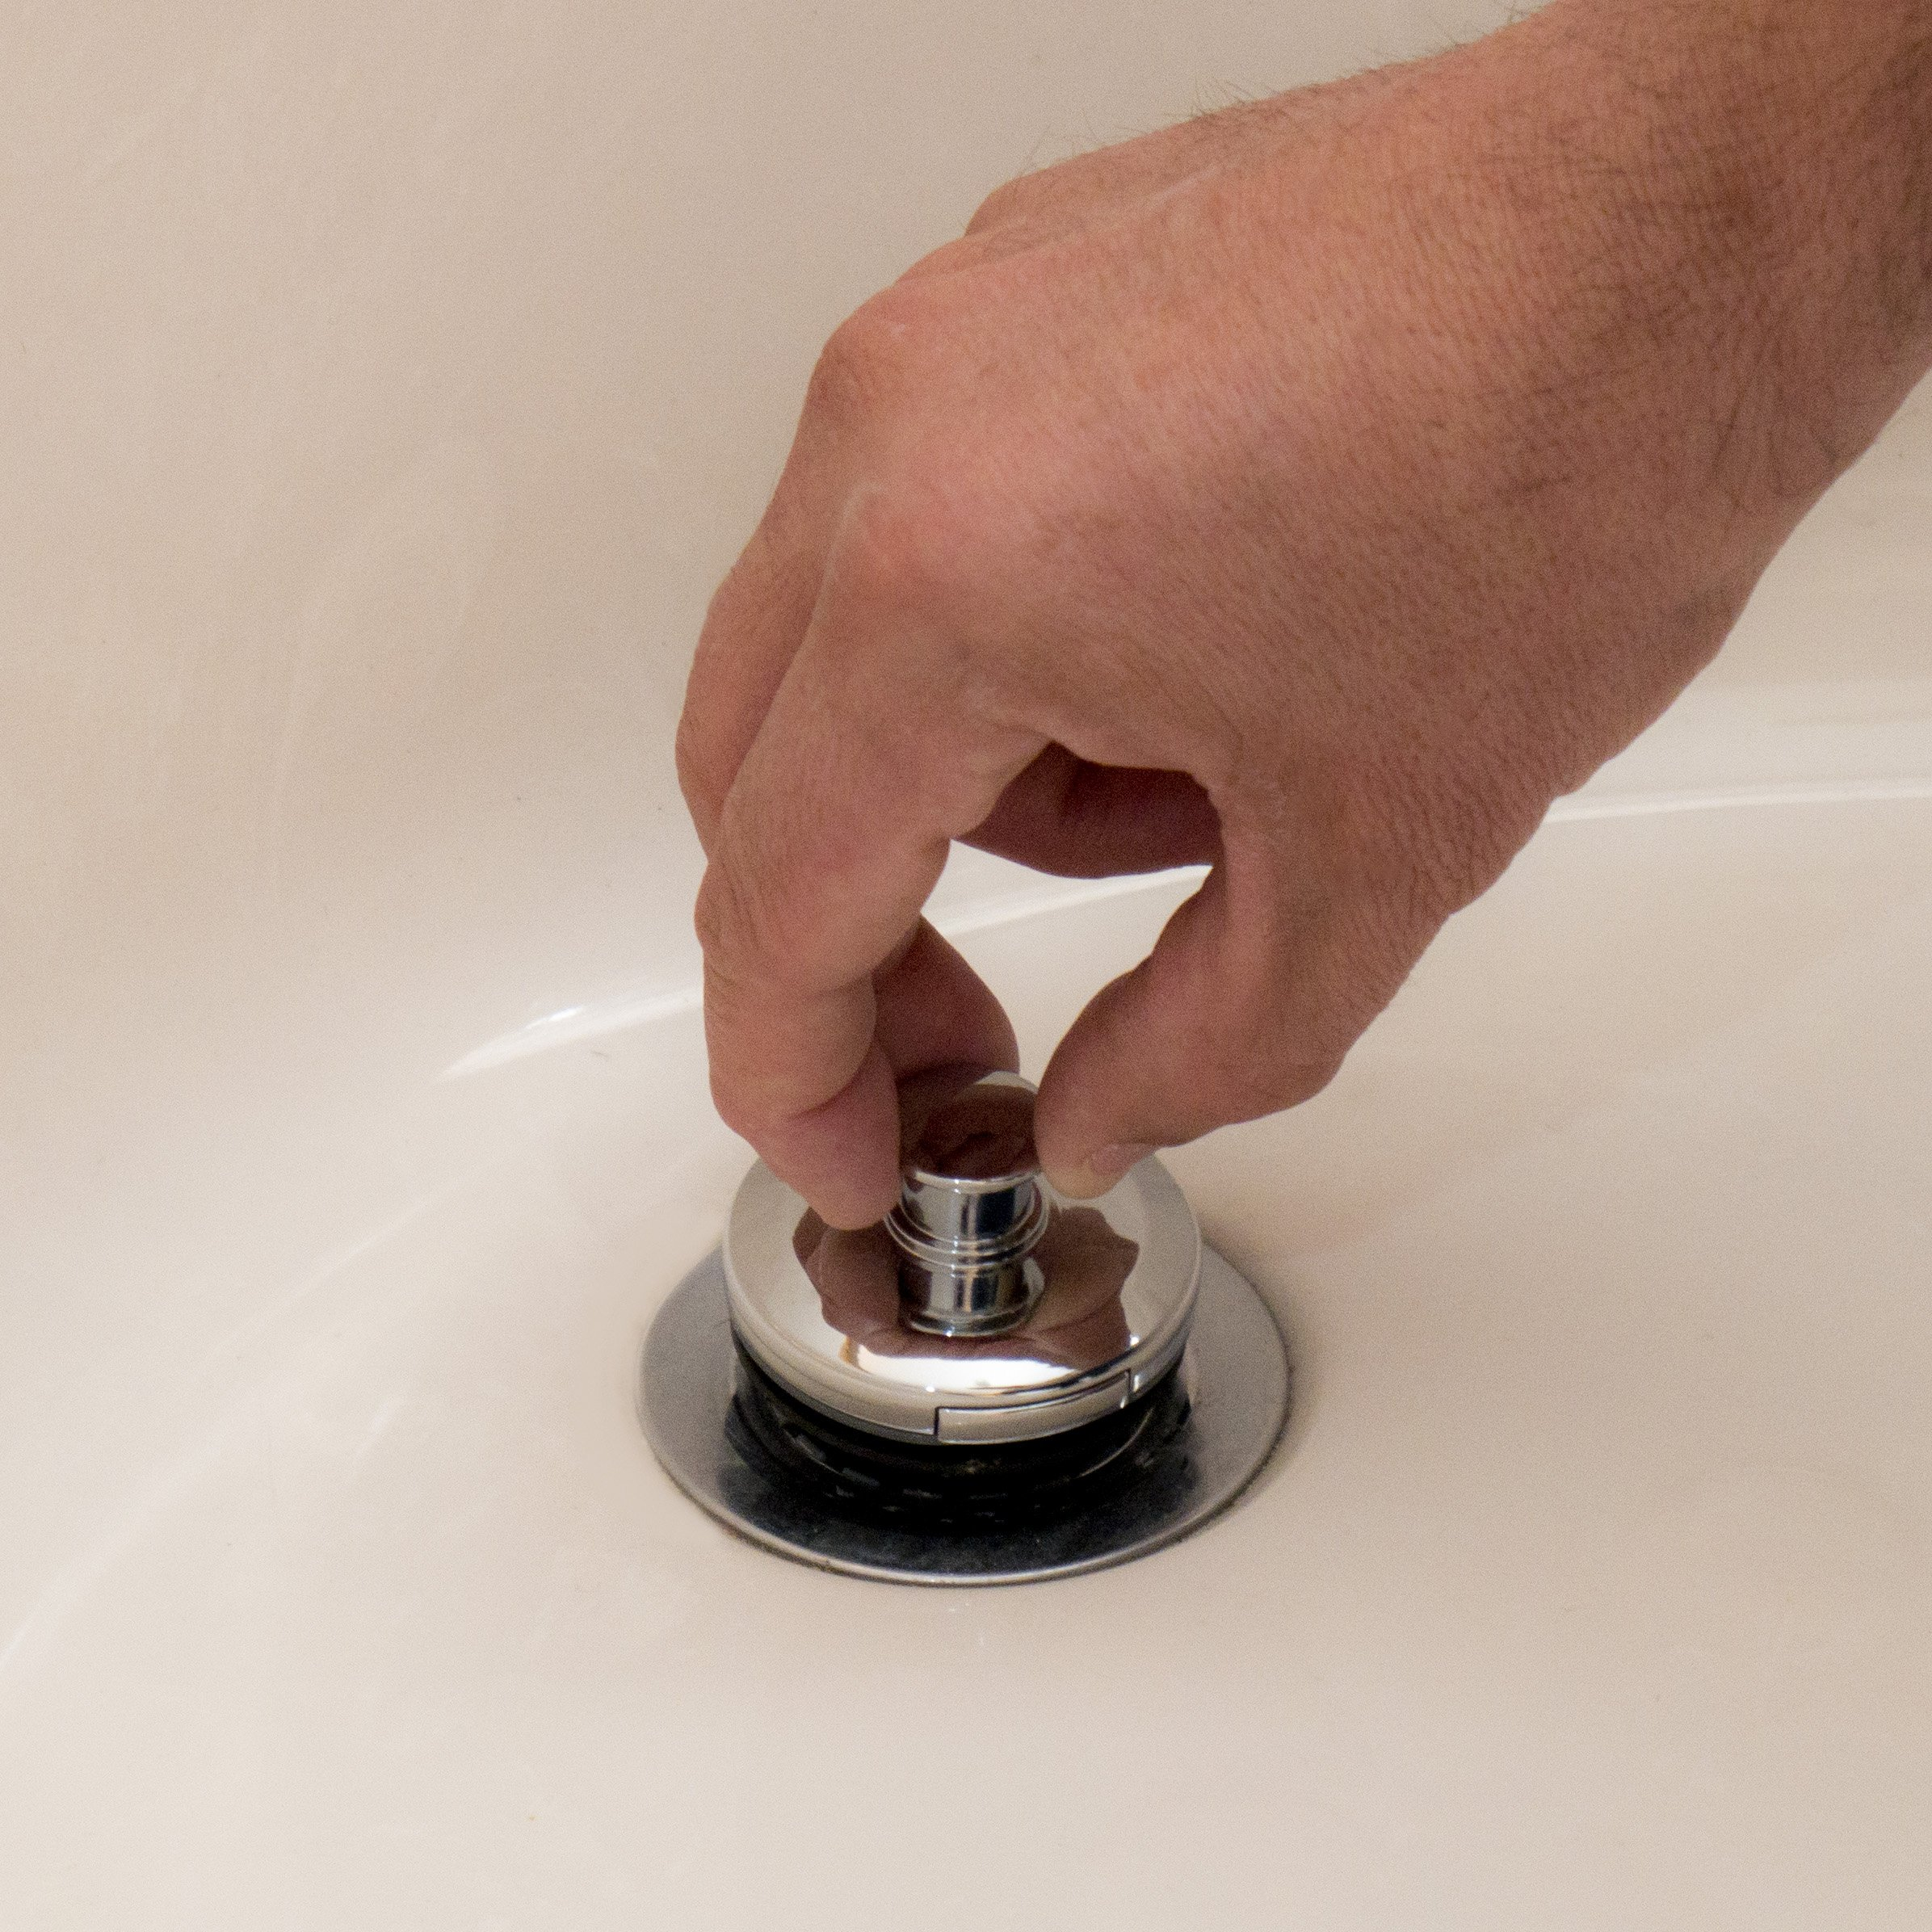 Drain Strain Clog Preventing Bathtub Drain Strainer Fits